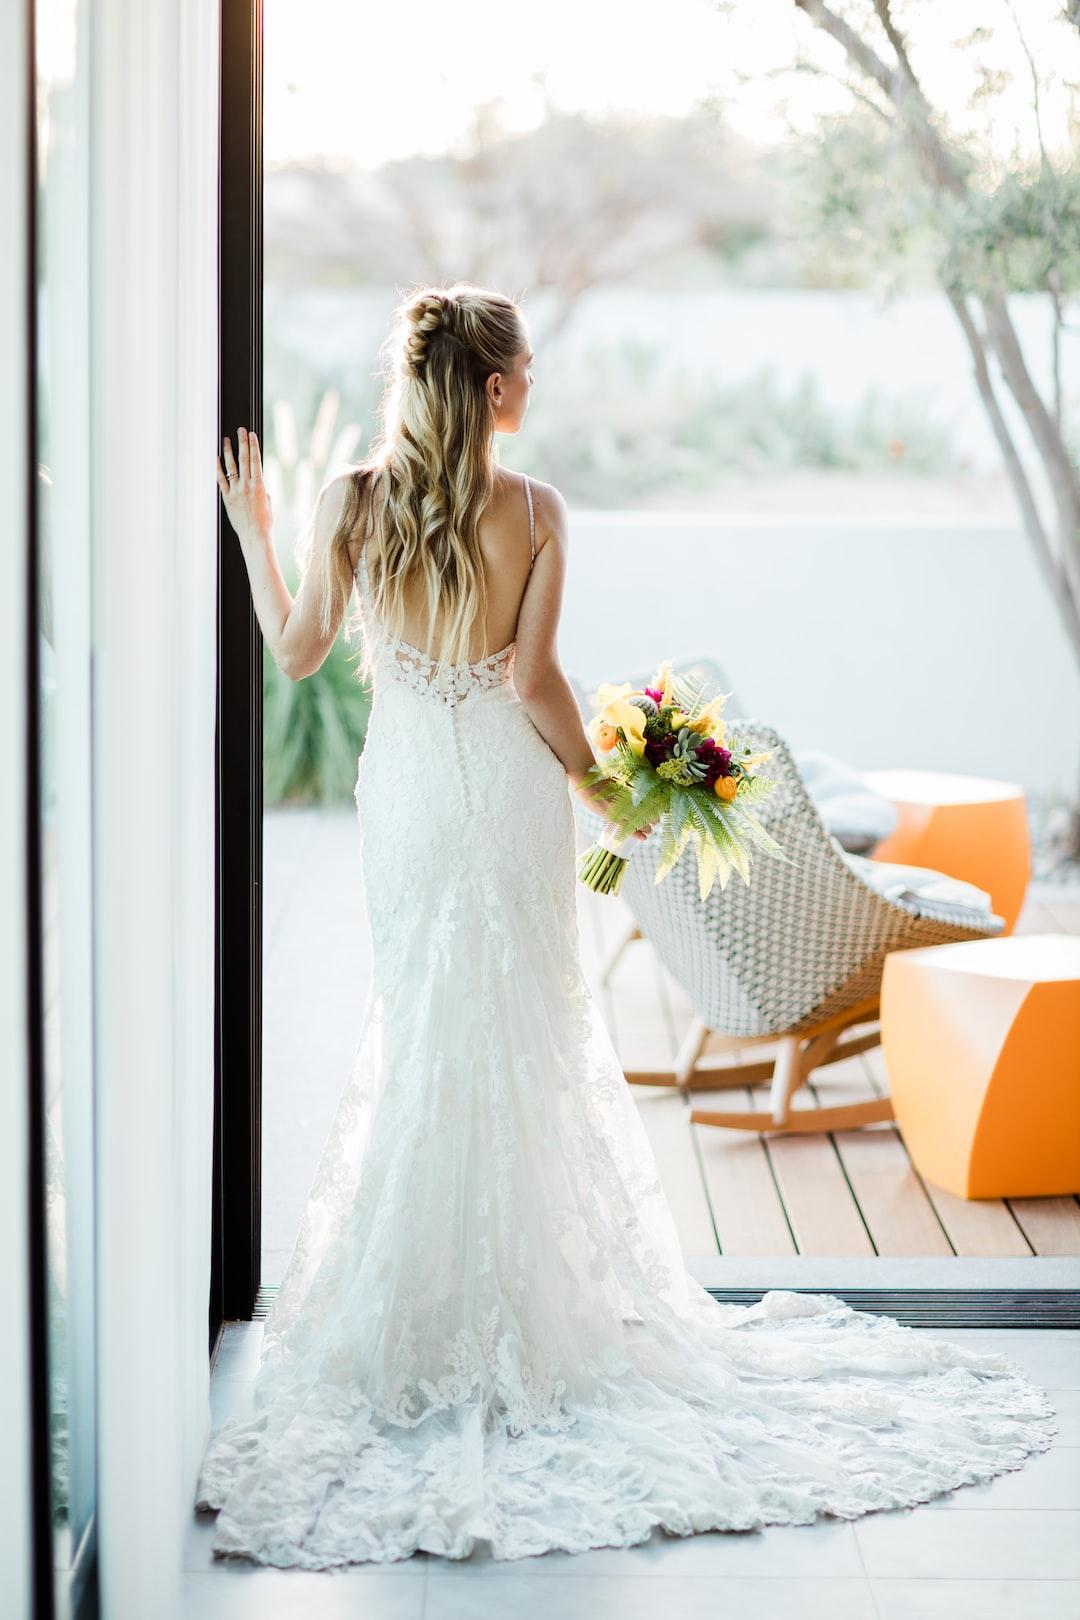 Andaz Scottsdale Wedding Photo. Shot for Something New Media